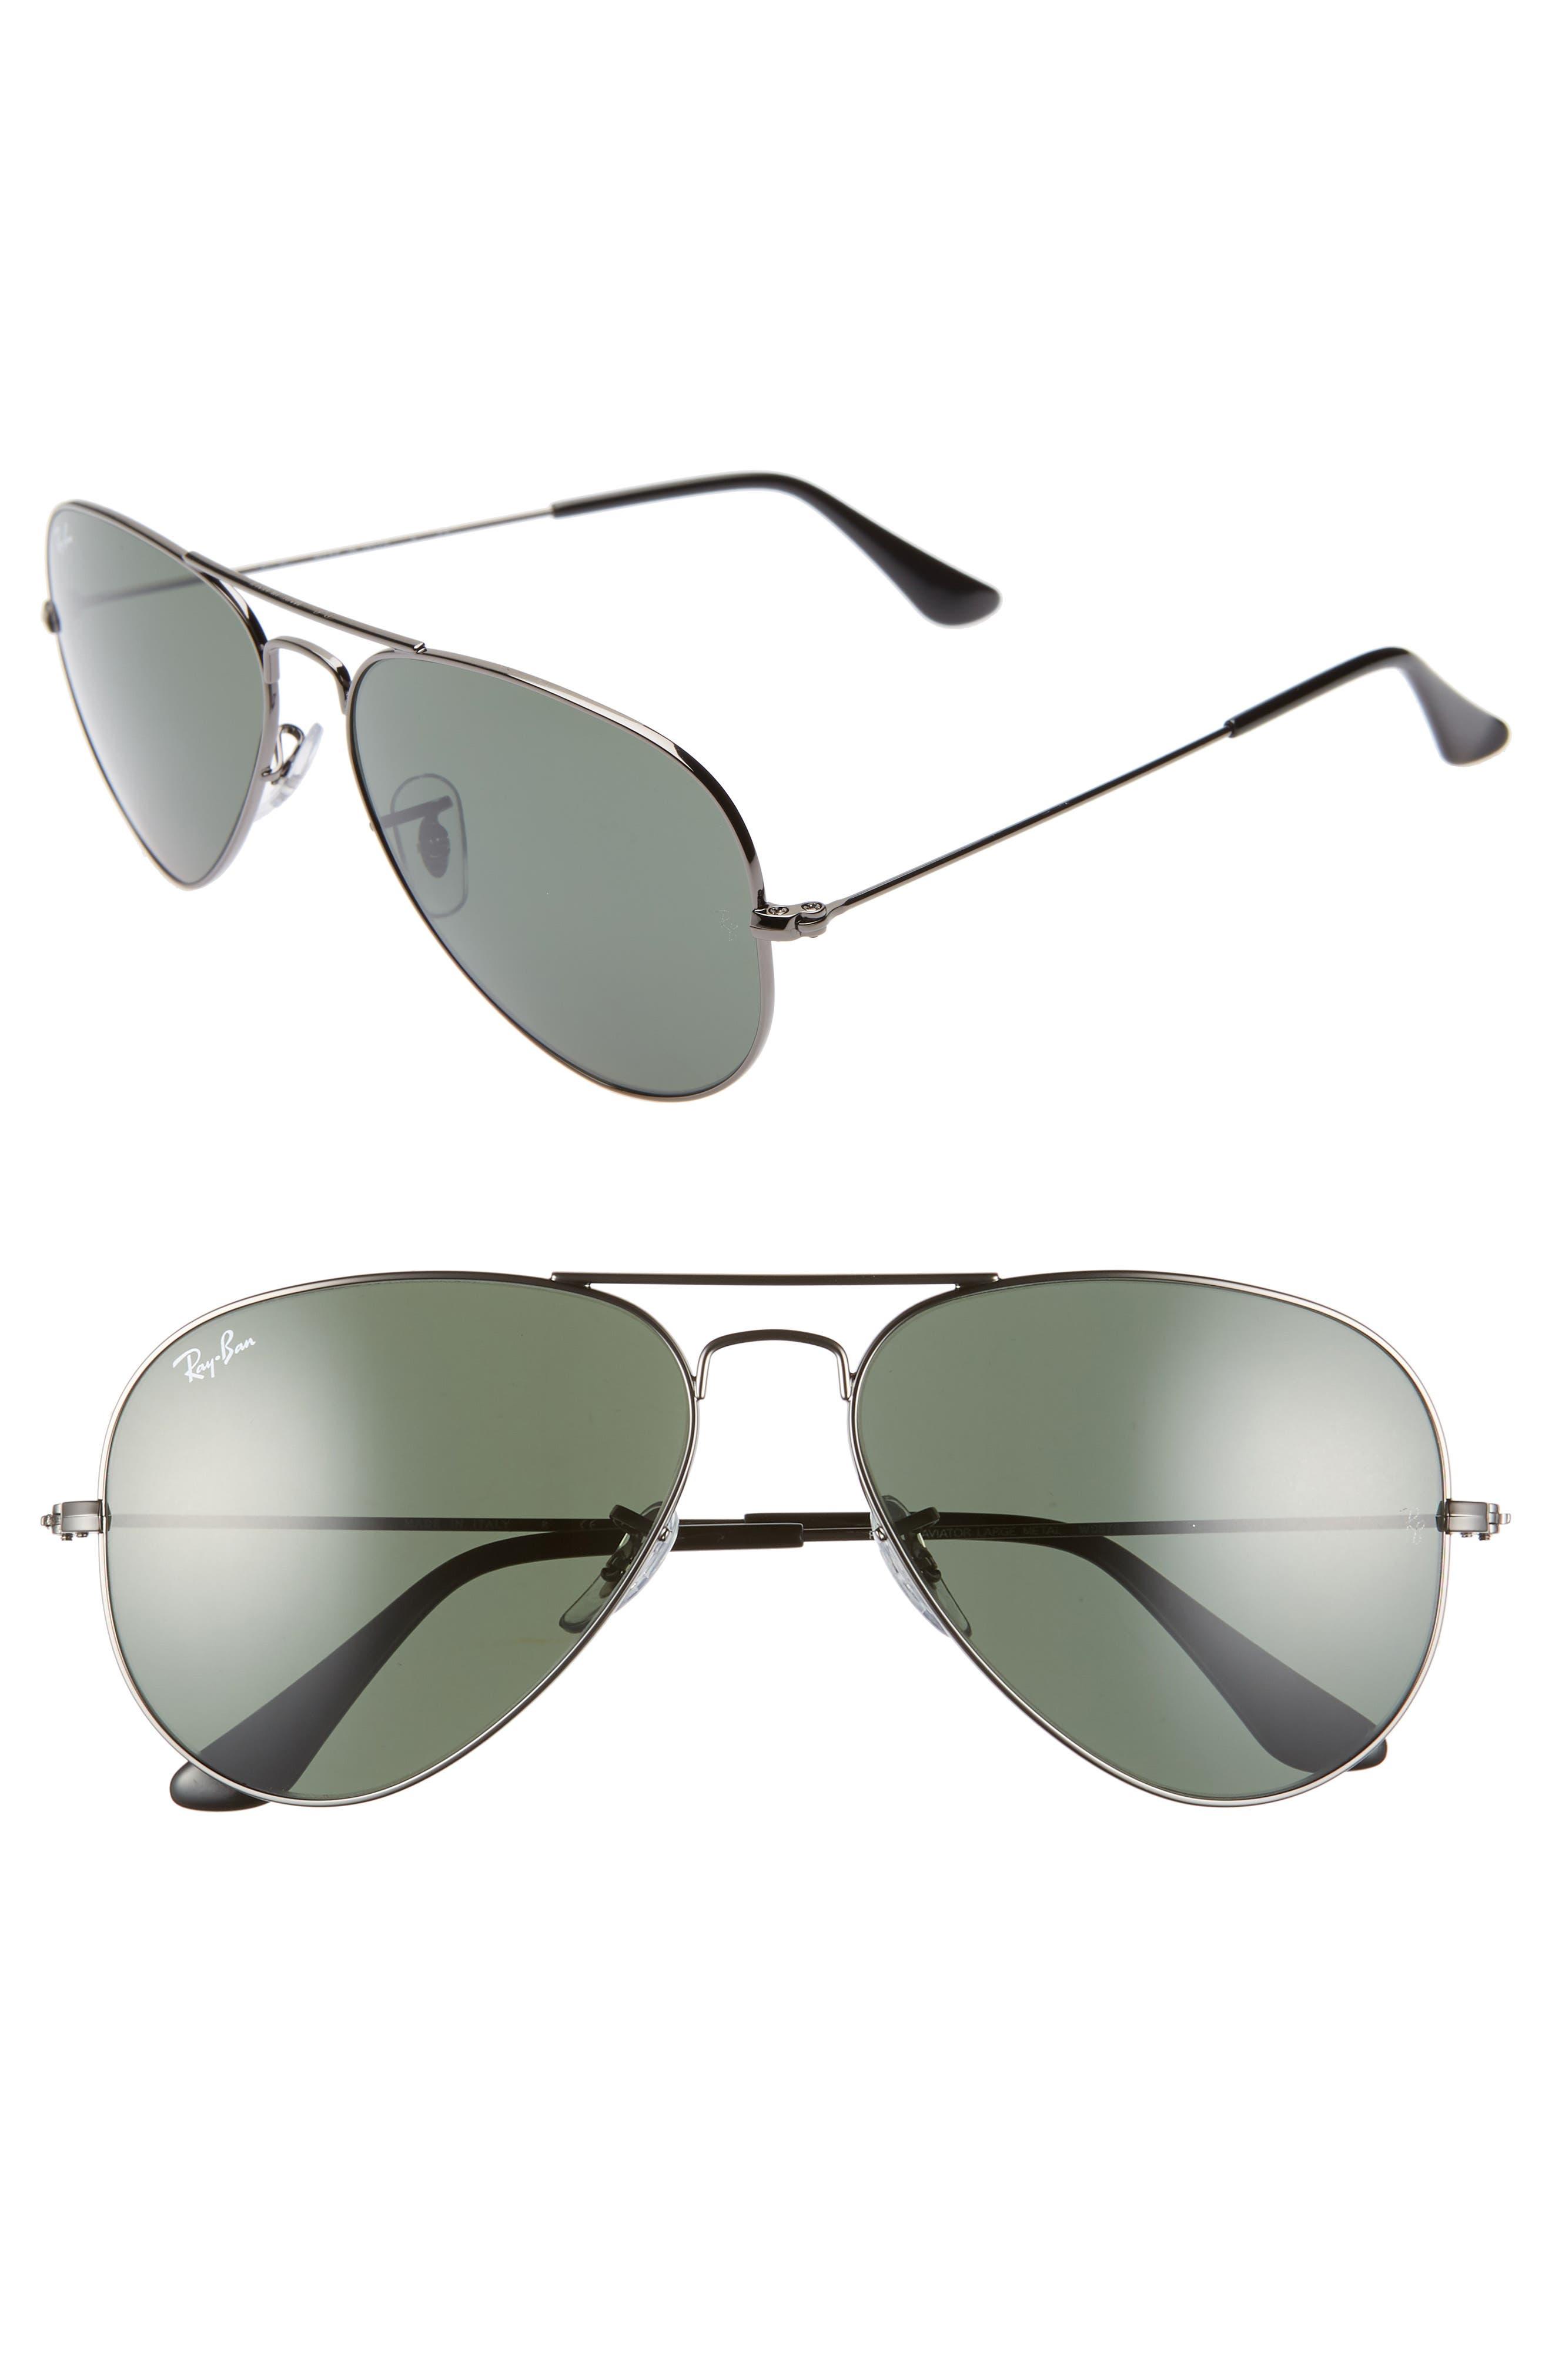 Ray-Ban Standard Original 5m Aviator Sunglasses - Gunmetal